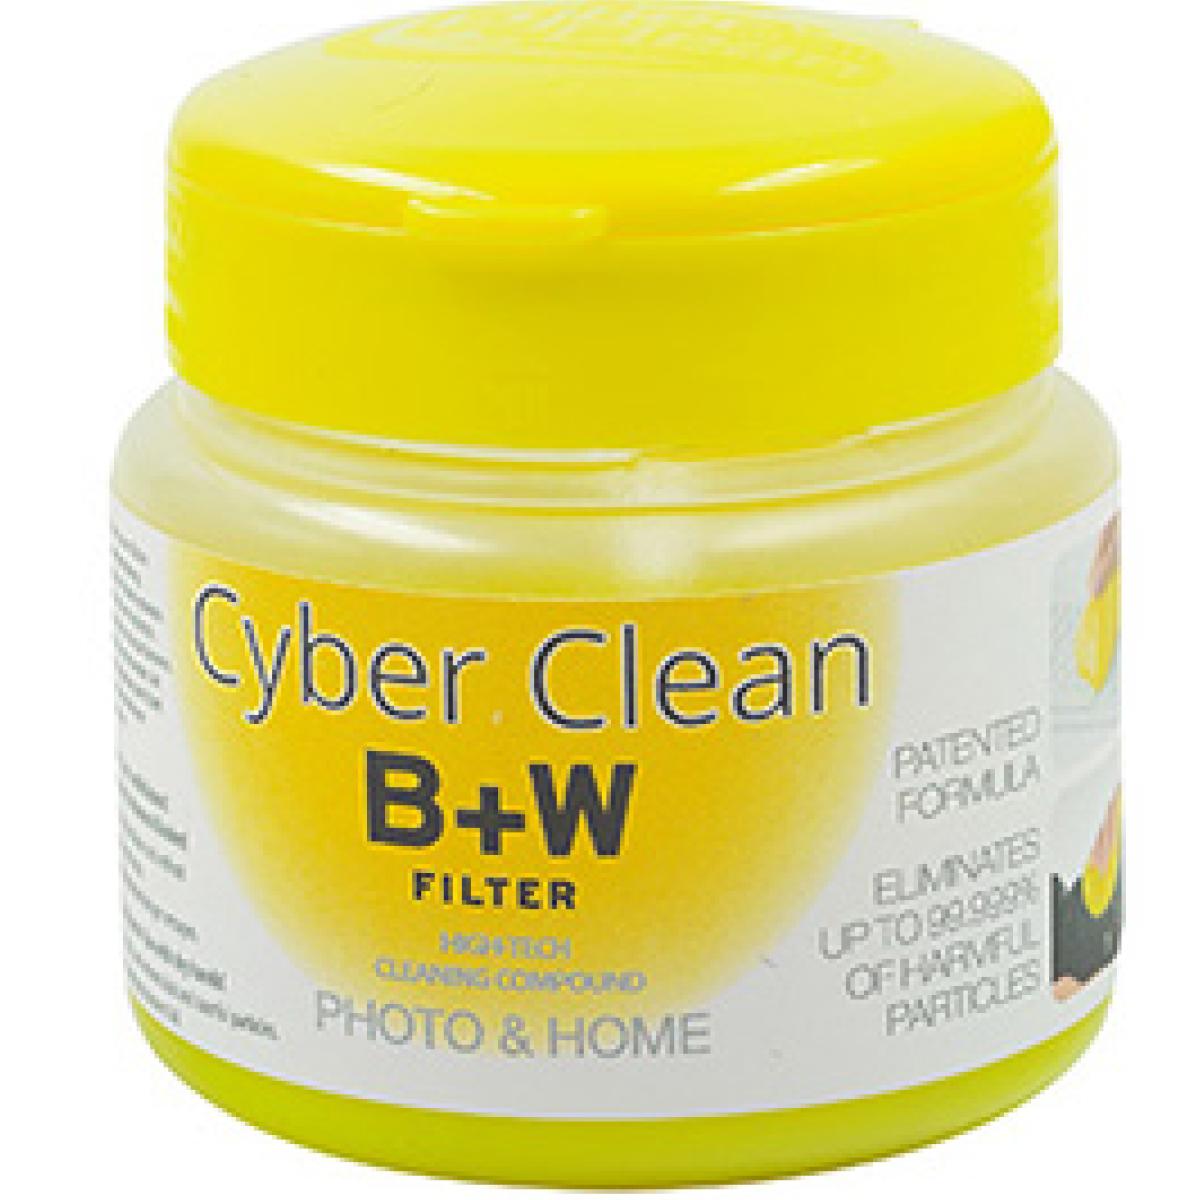 B+W Cyber Clean